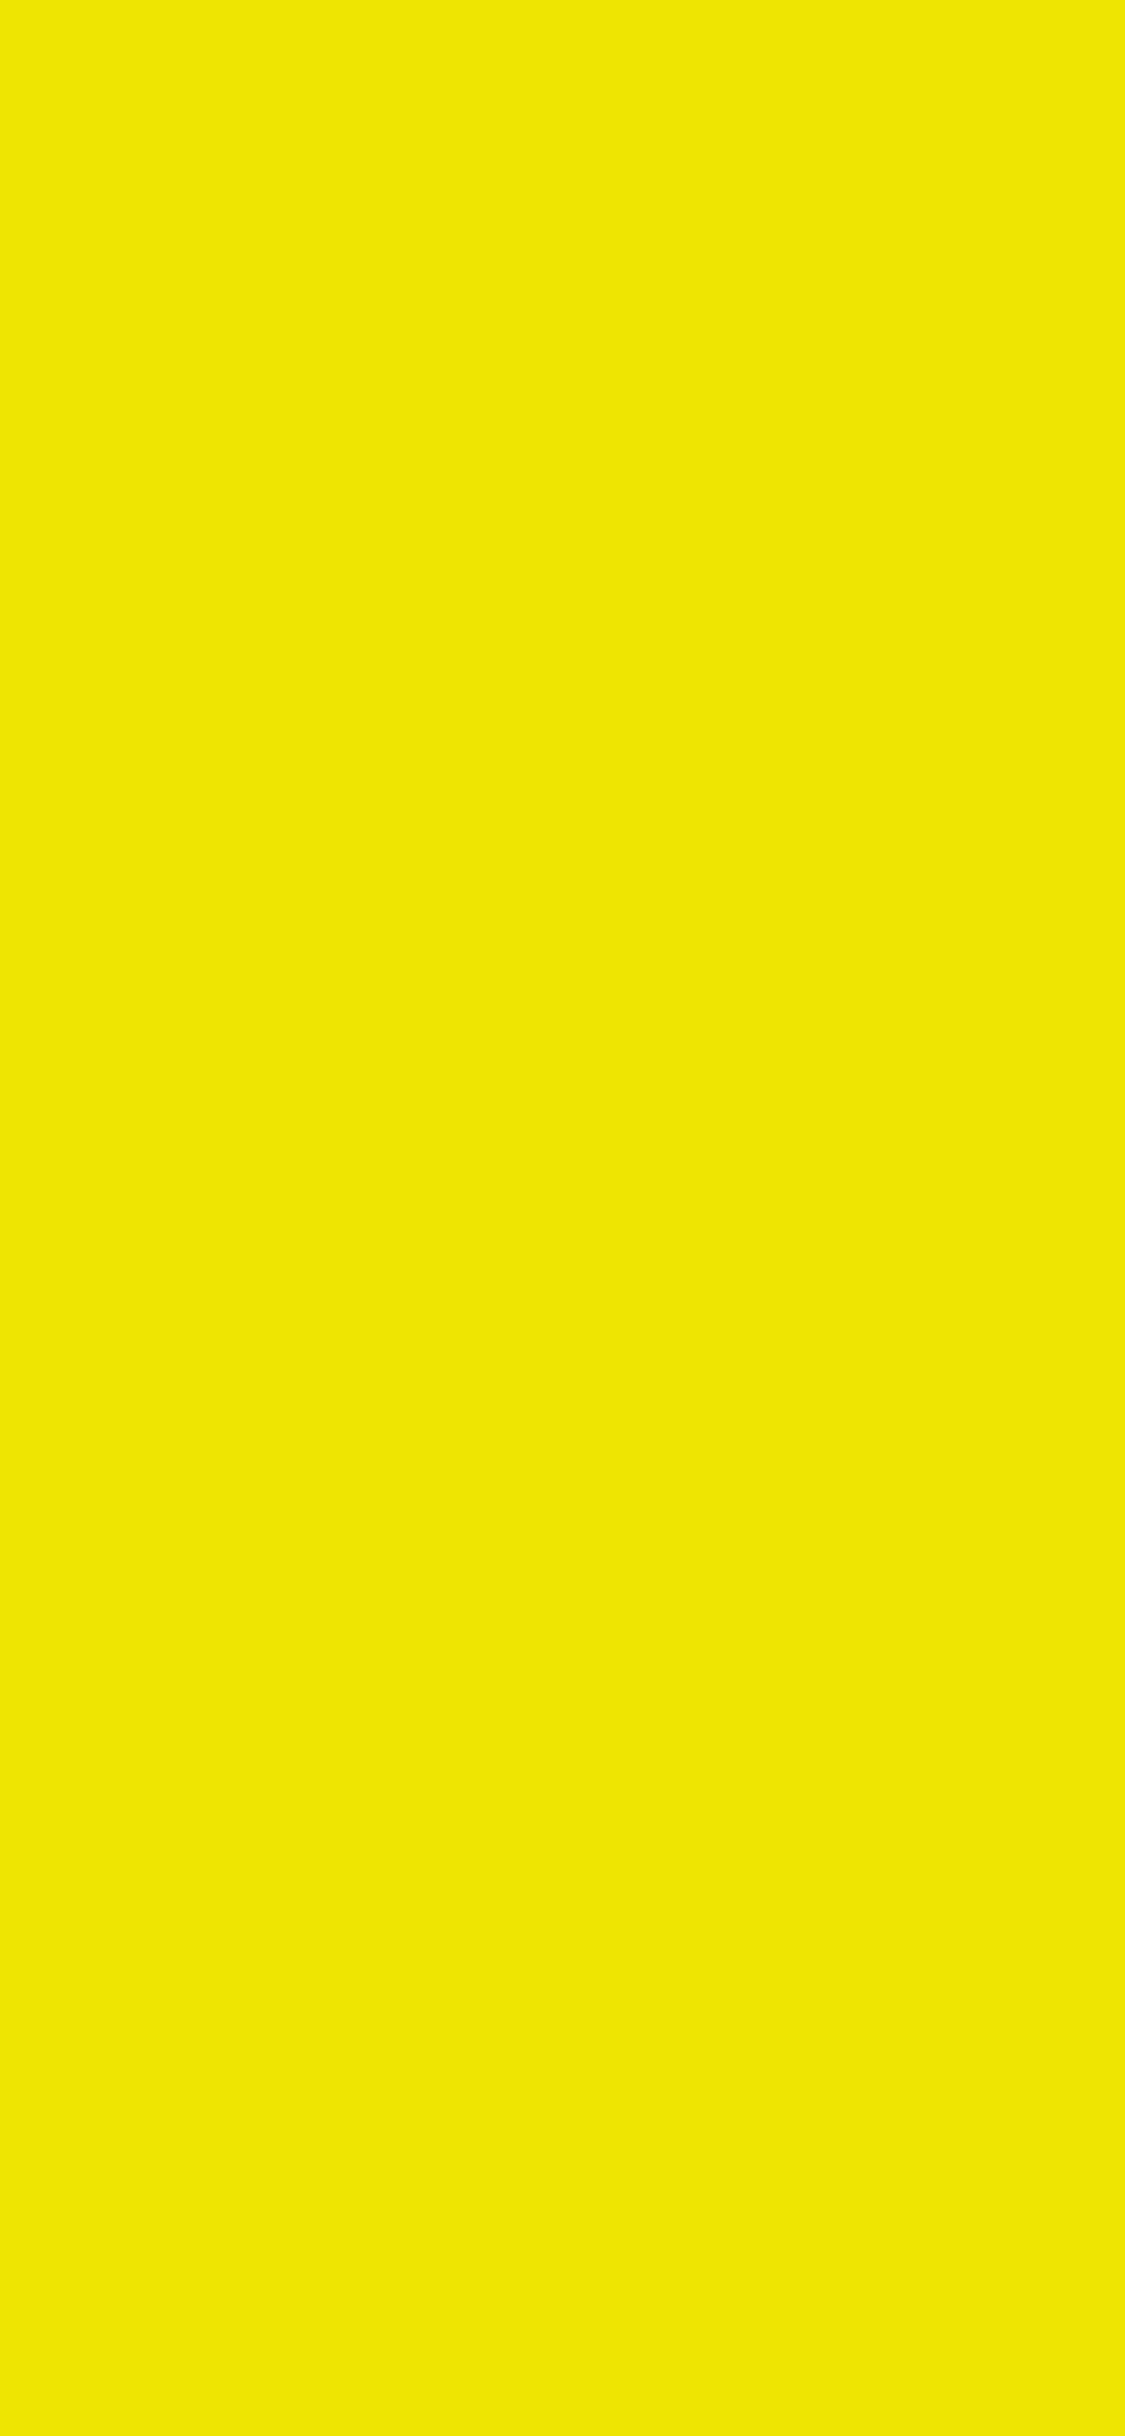 1125x2436 Titanium Yellow Solid Color Background